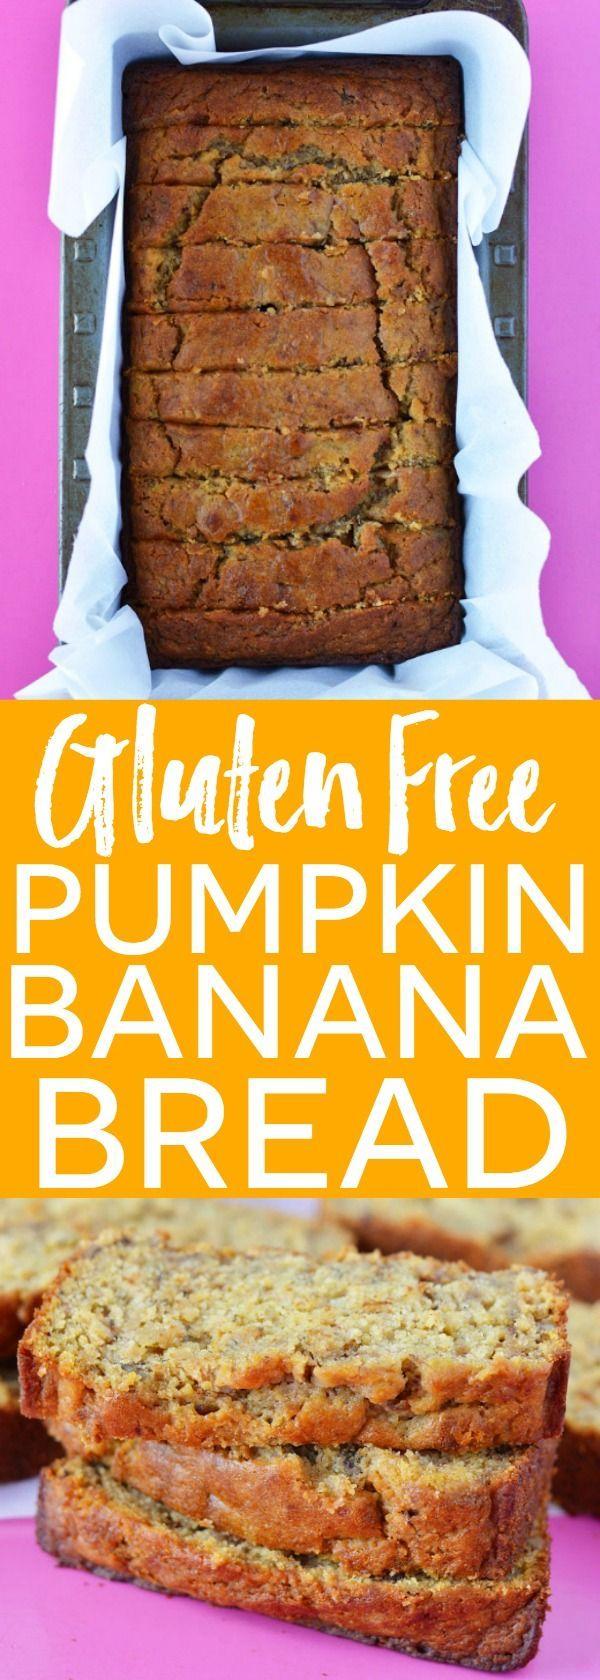 Gluten Free Pumpkin Banana Bread. Recipe from @whattheforkblog…